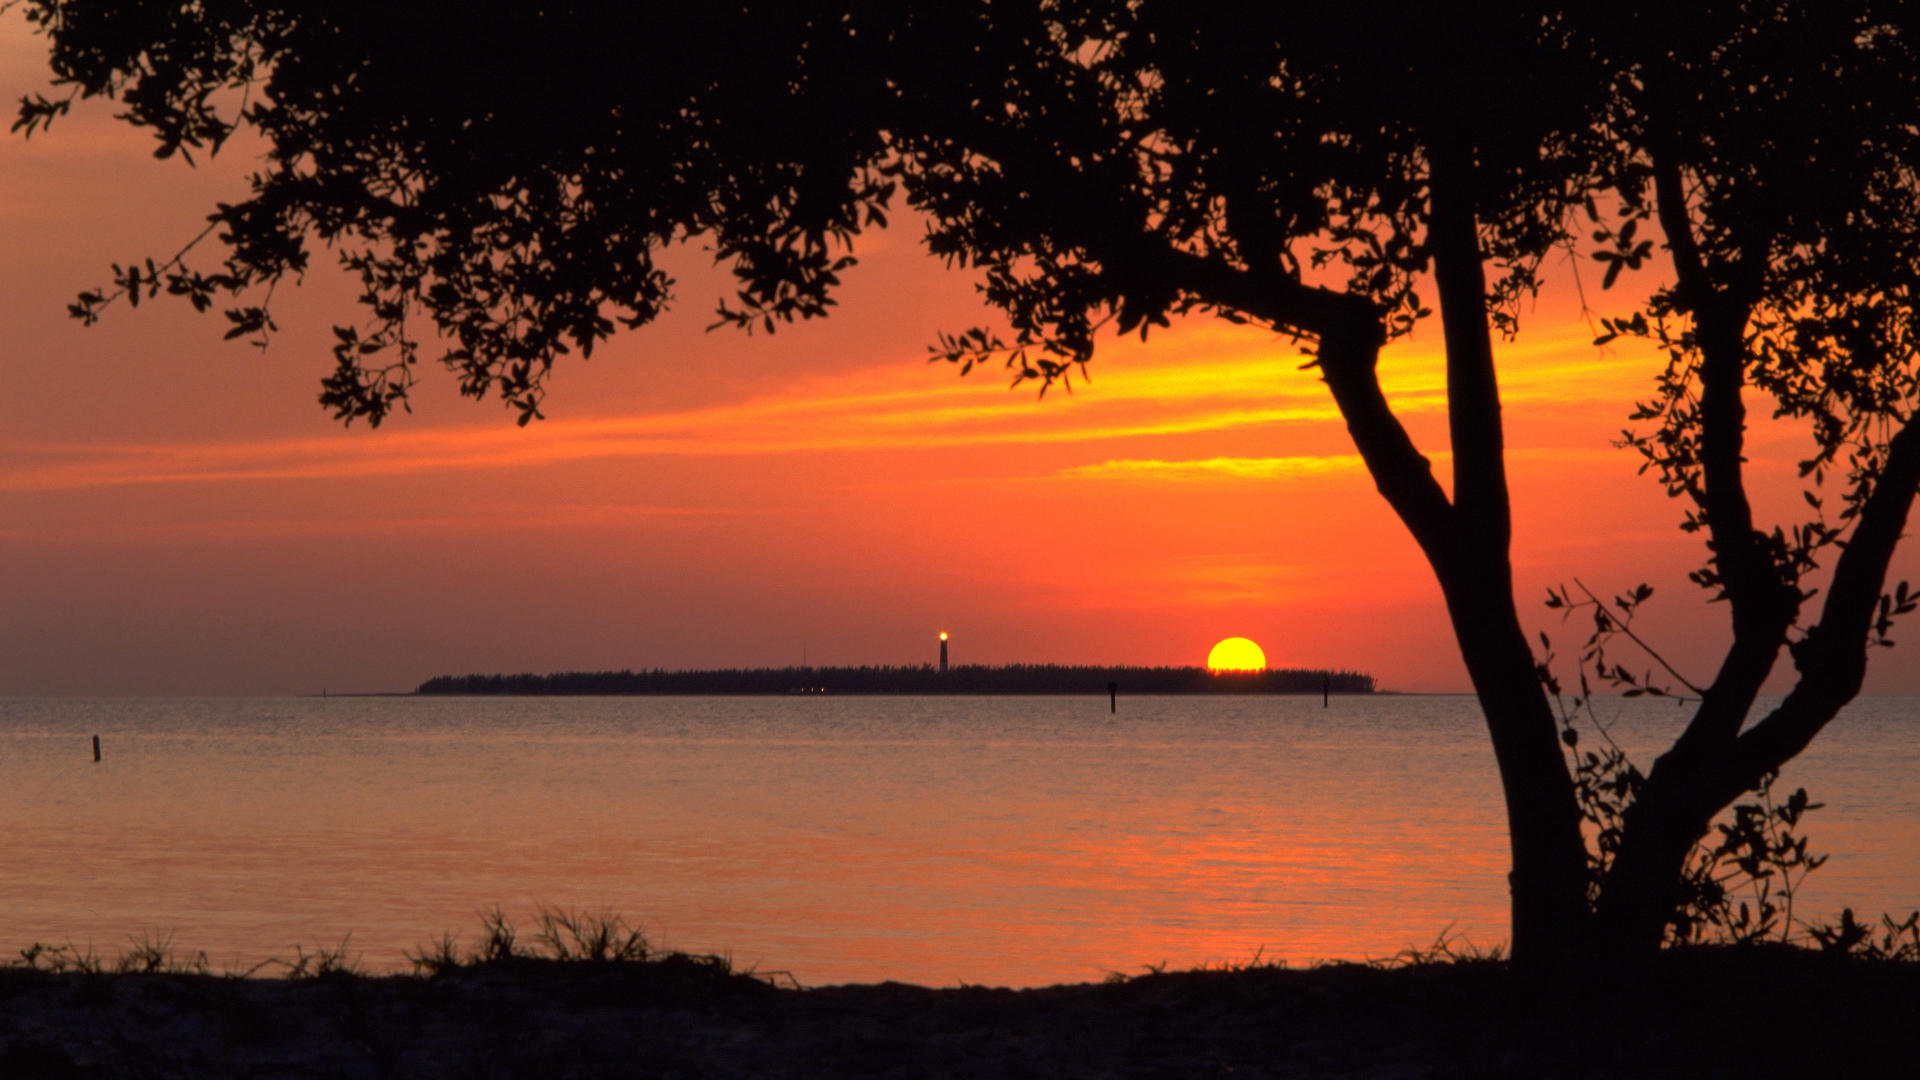 Backgrounds Sunset Desktop Florida Tortugas Jefferson National Park HD 1920x1080